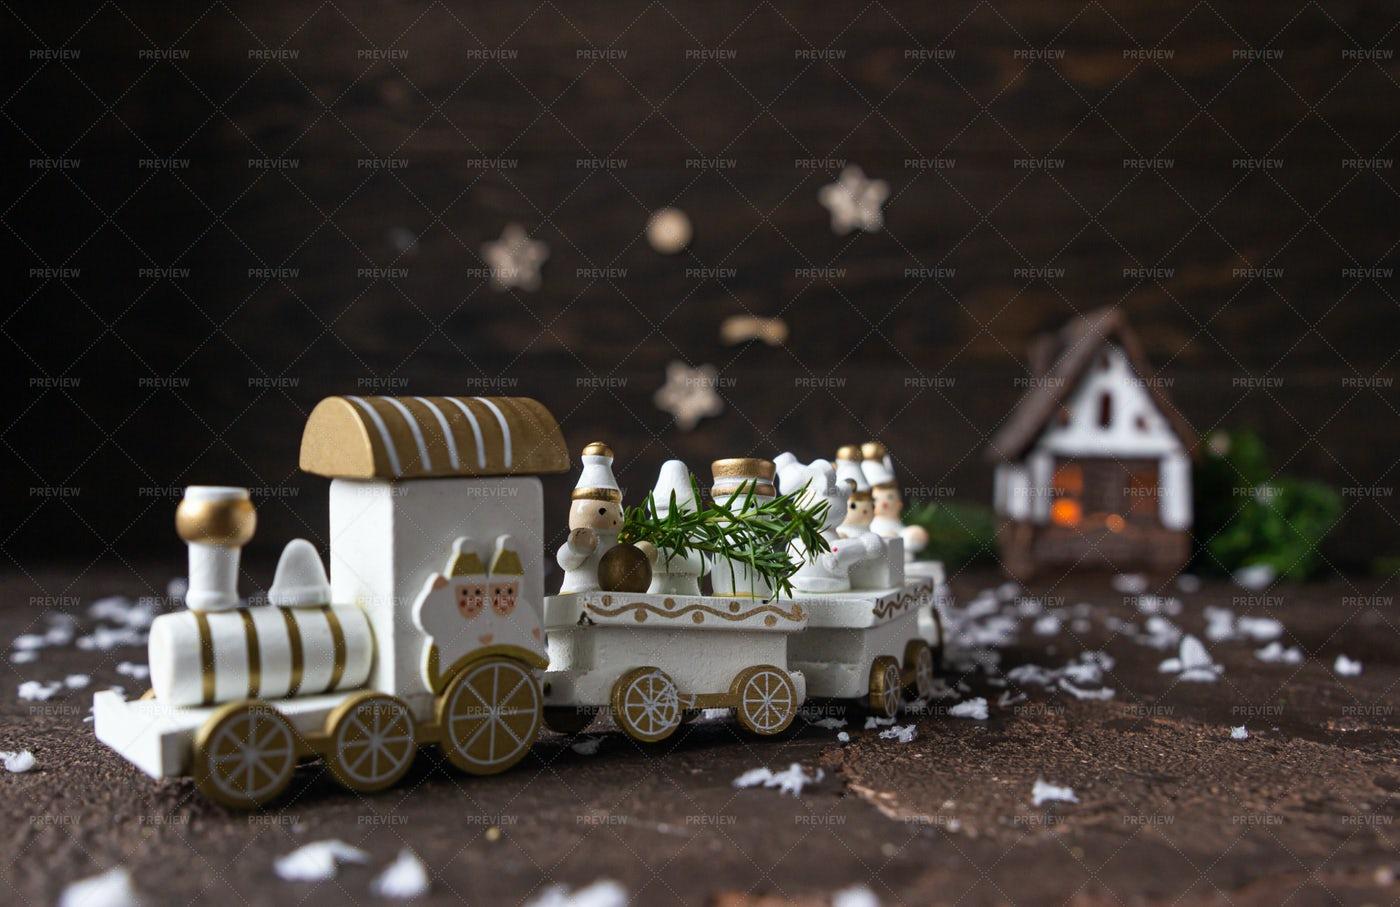 Festive Christmas Wooden Train: Stock Photos